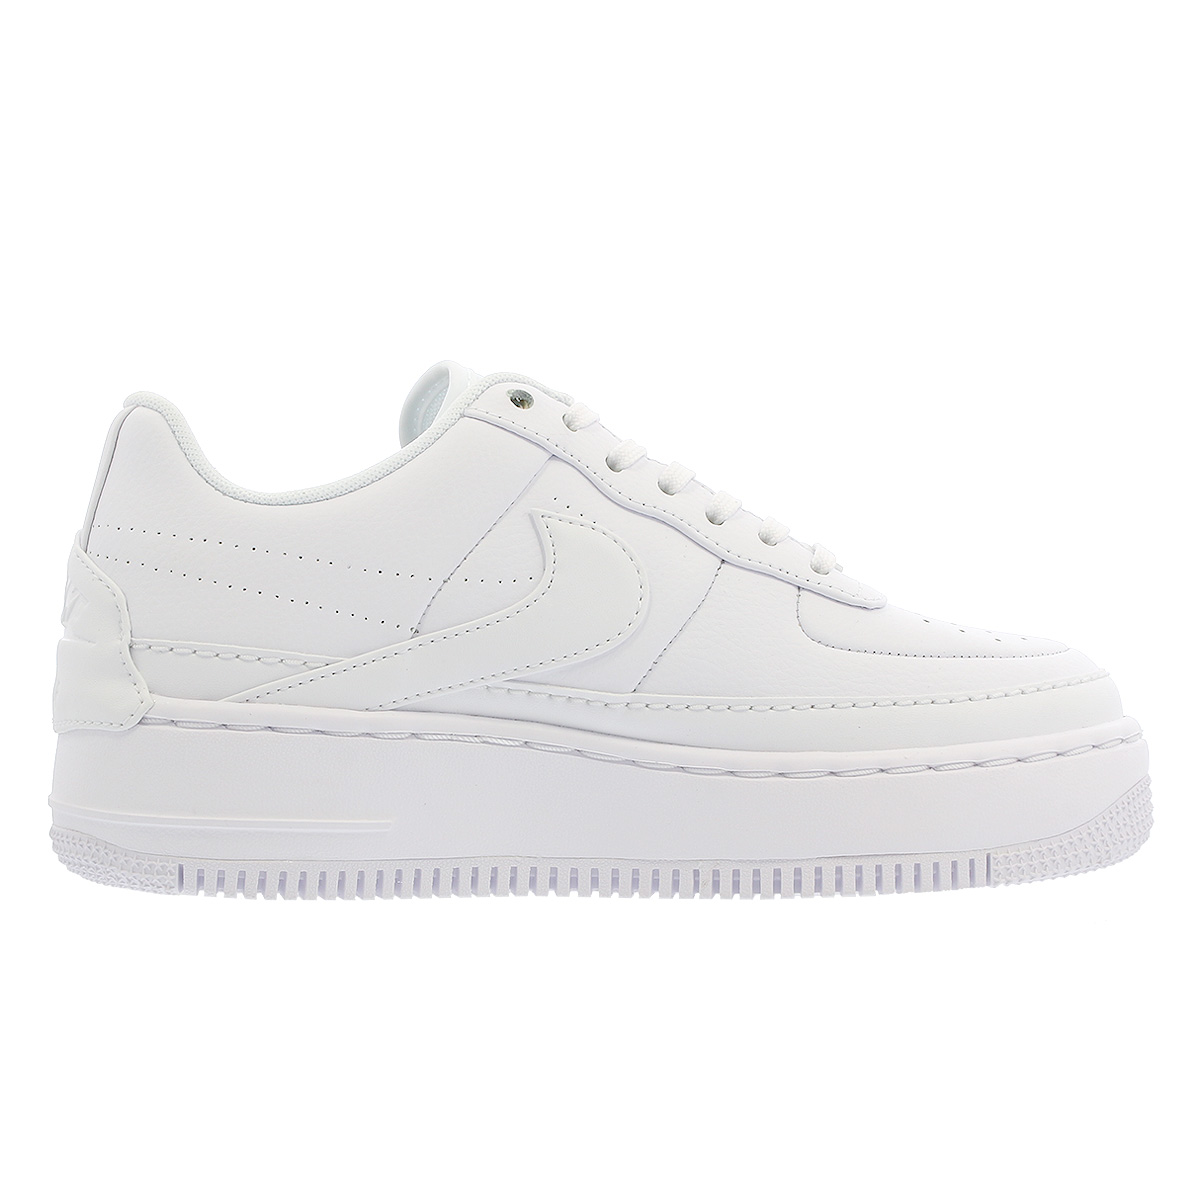 NIKE WMNS AIR FORCE 1 JESTER XX Nike women air force 1 Jester XX WHITEWHITEBLACK ao1220 101